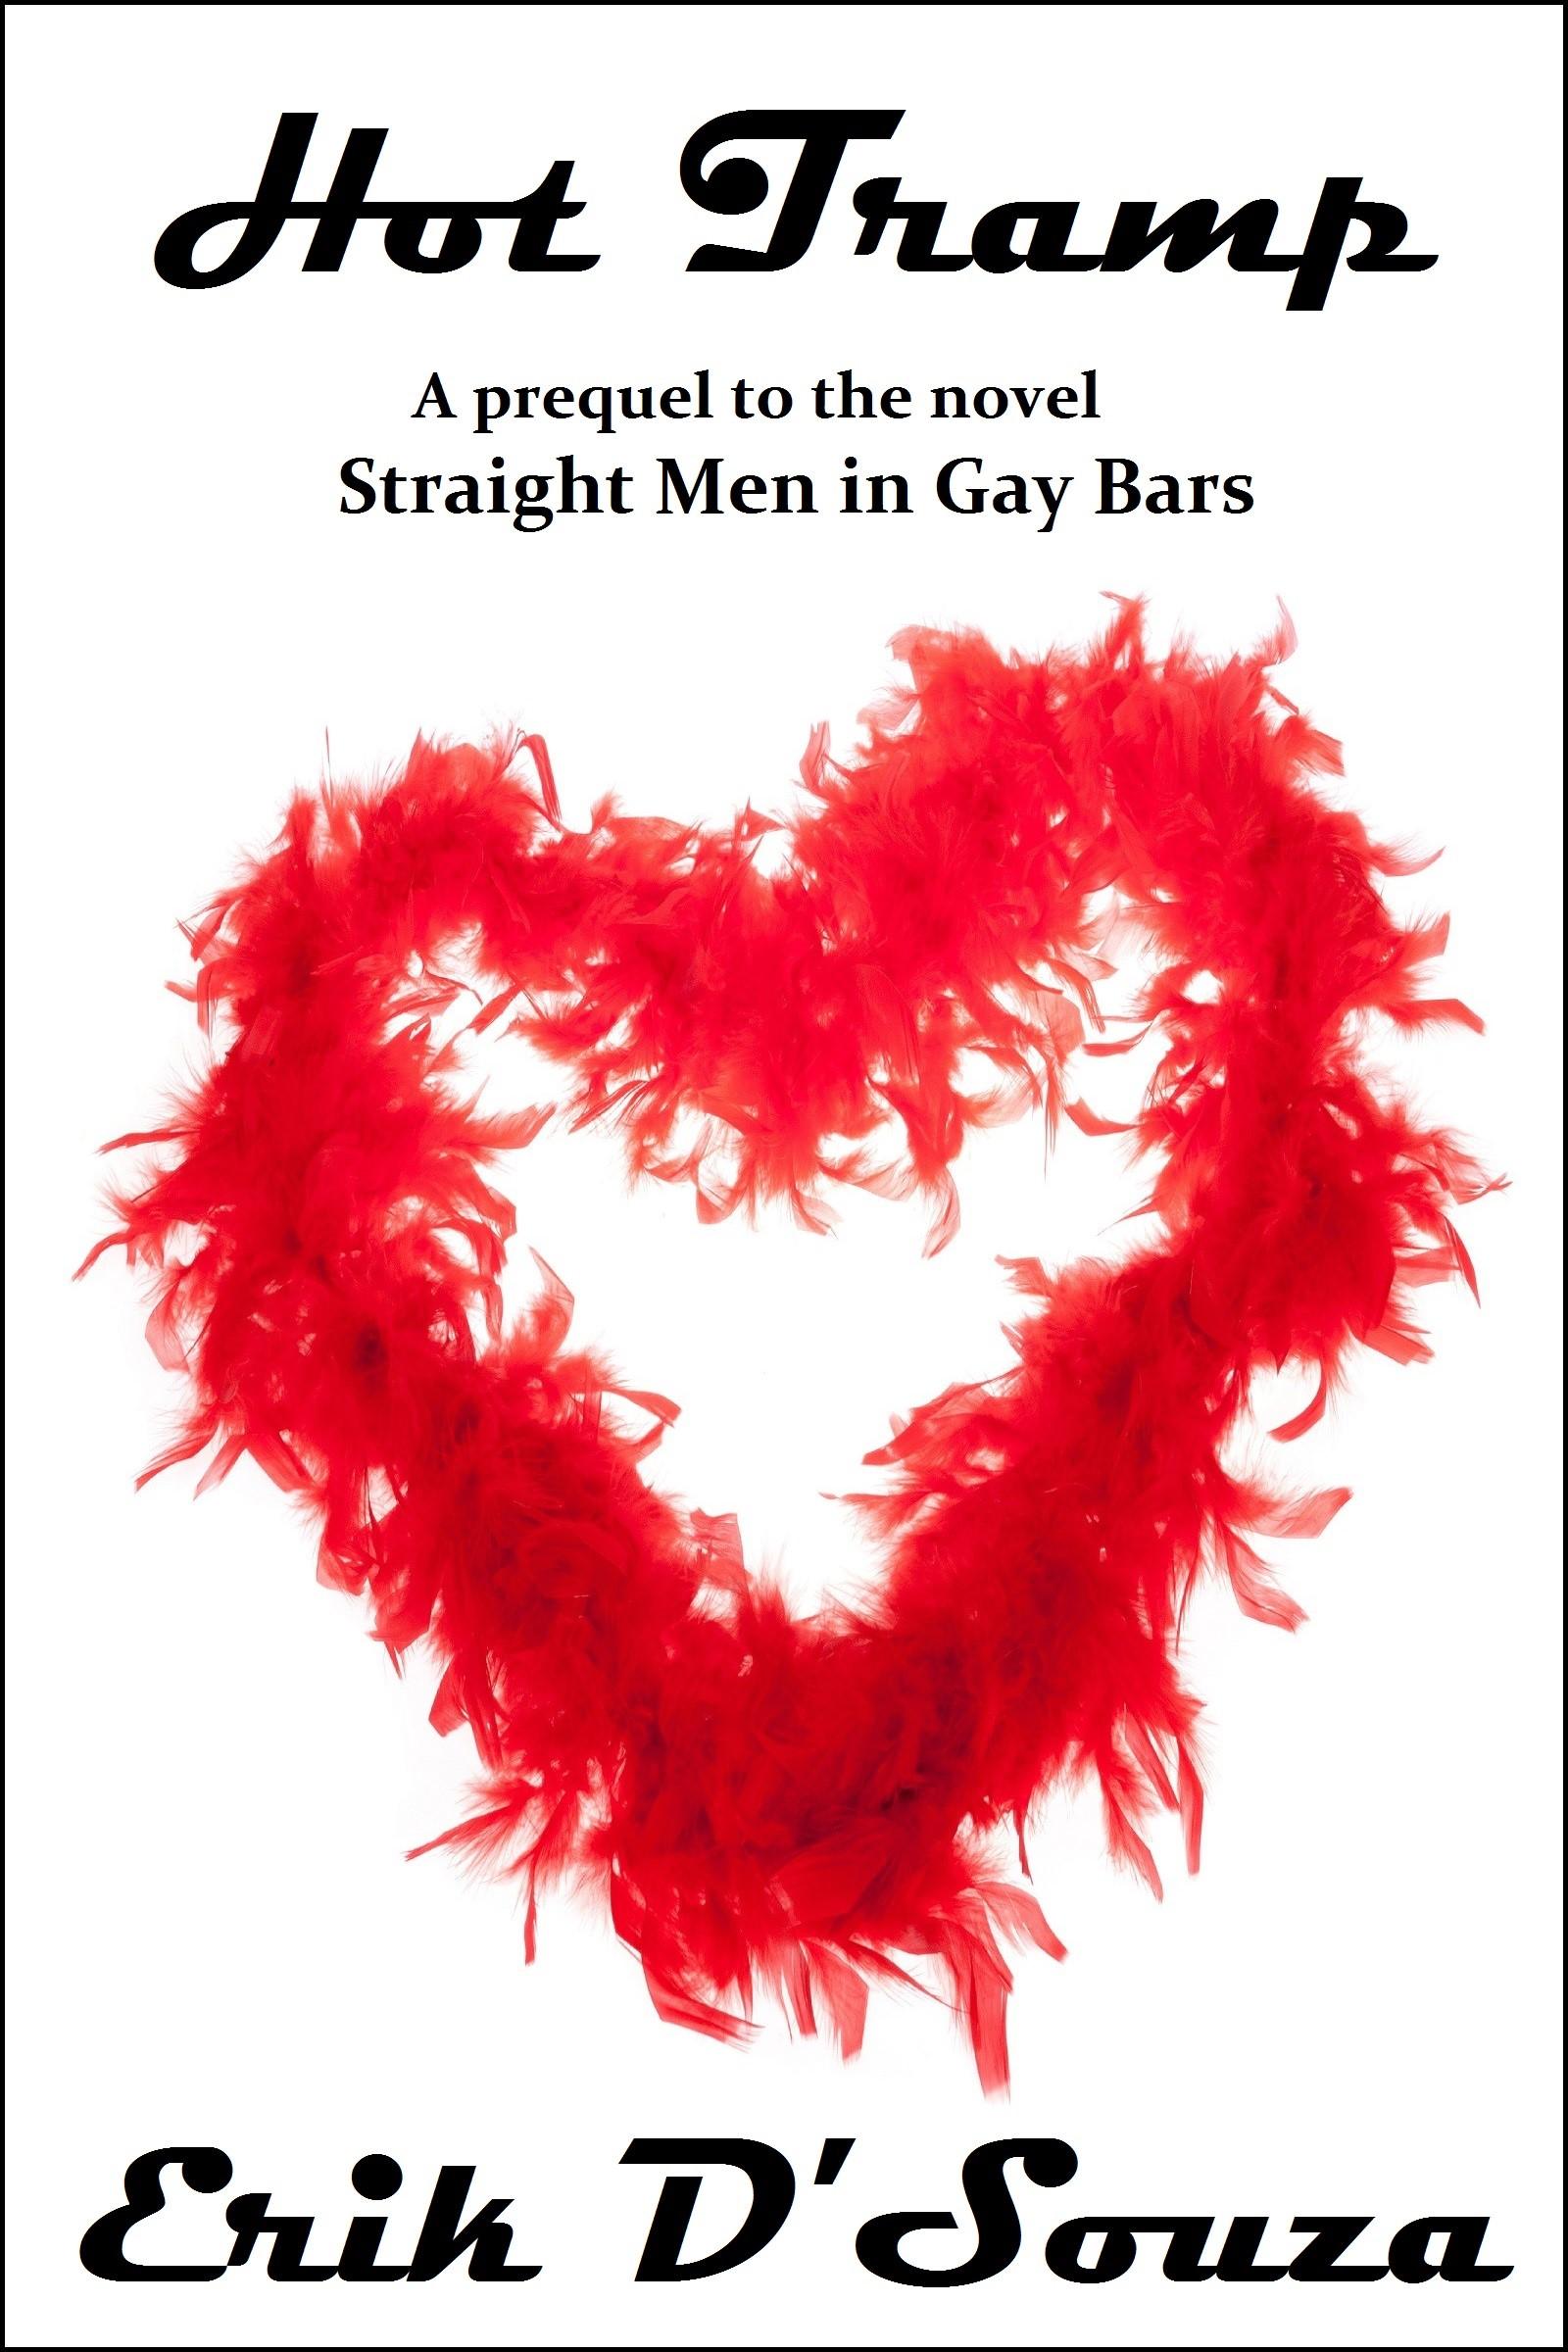 red feathers-boas, heart shape